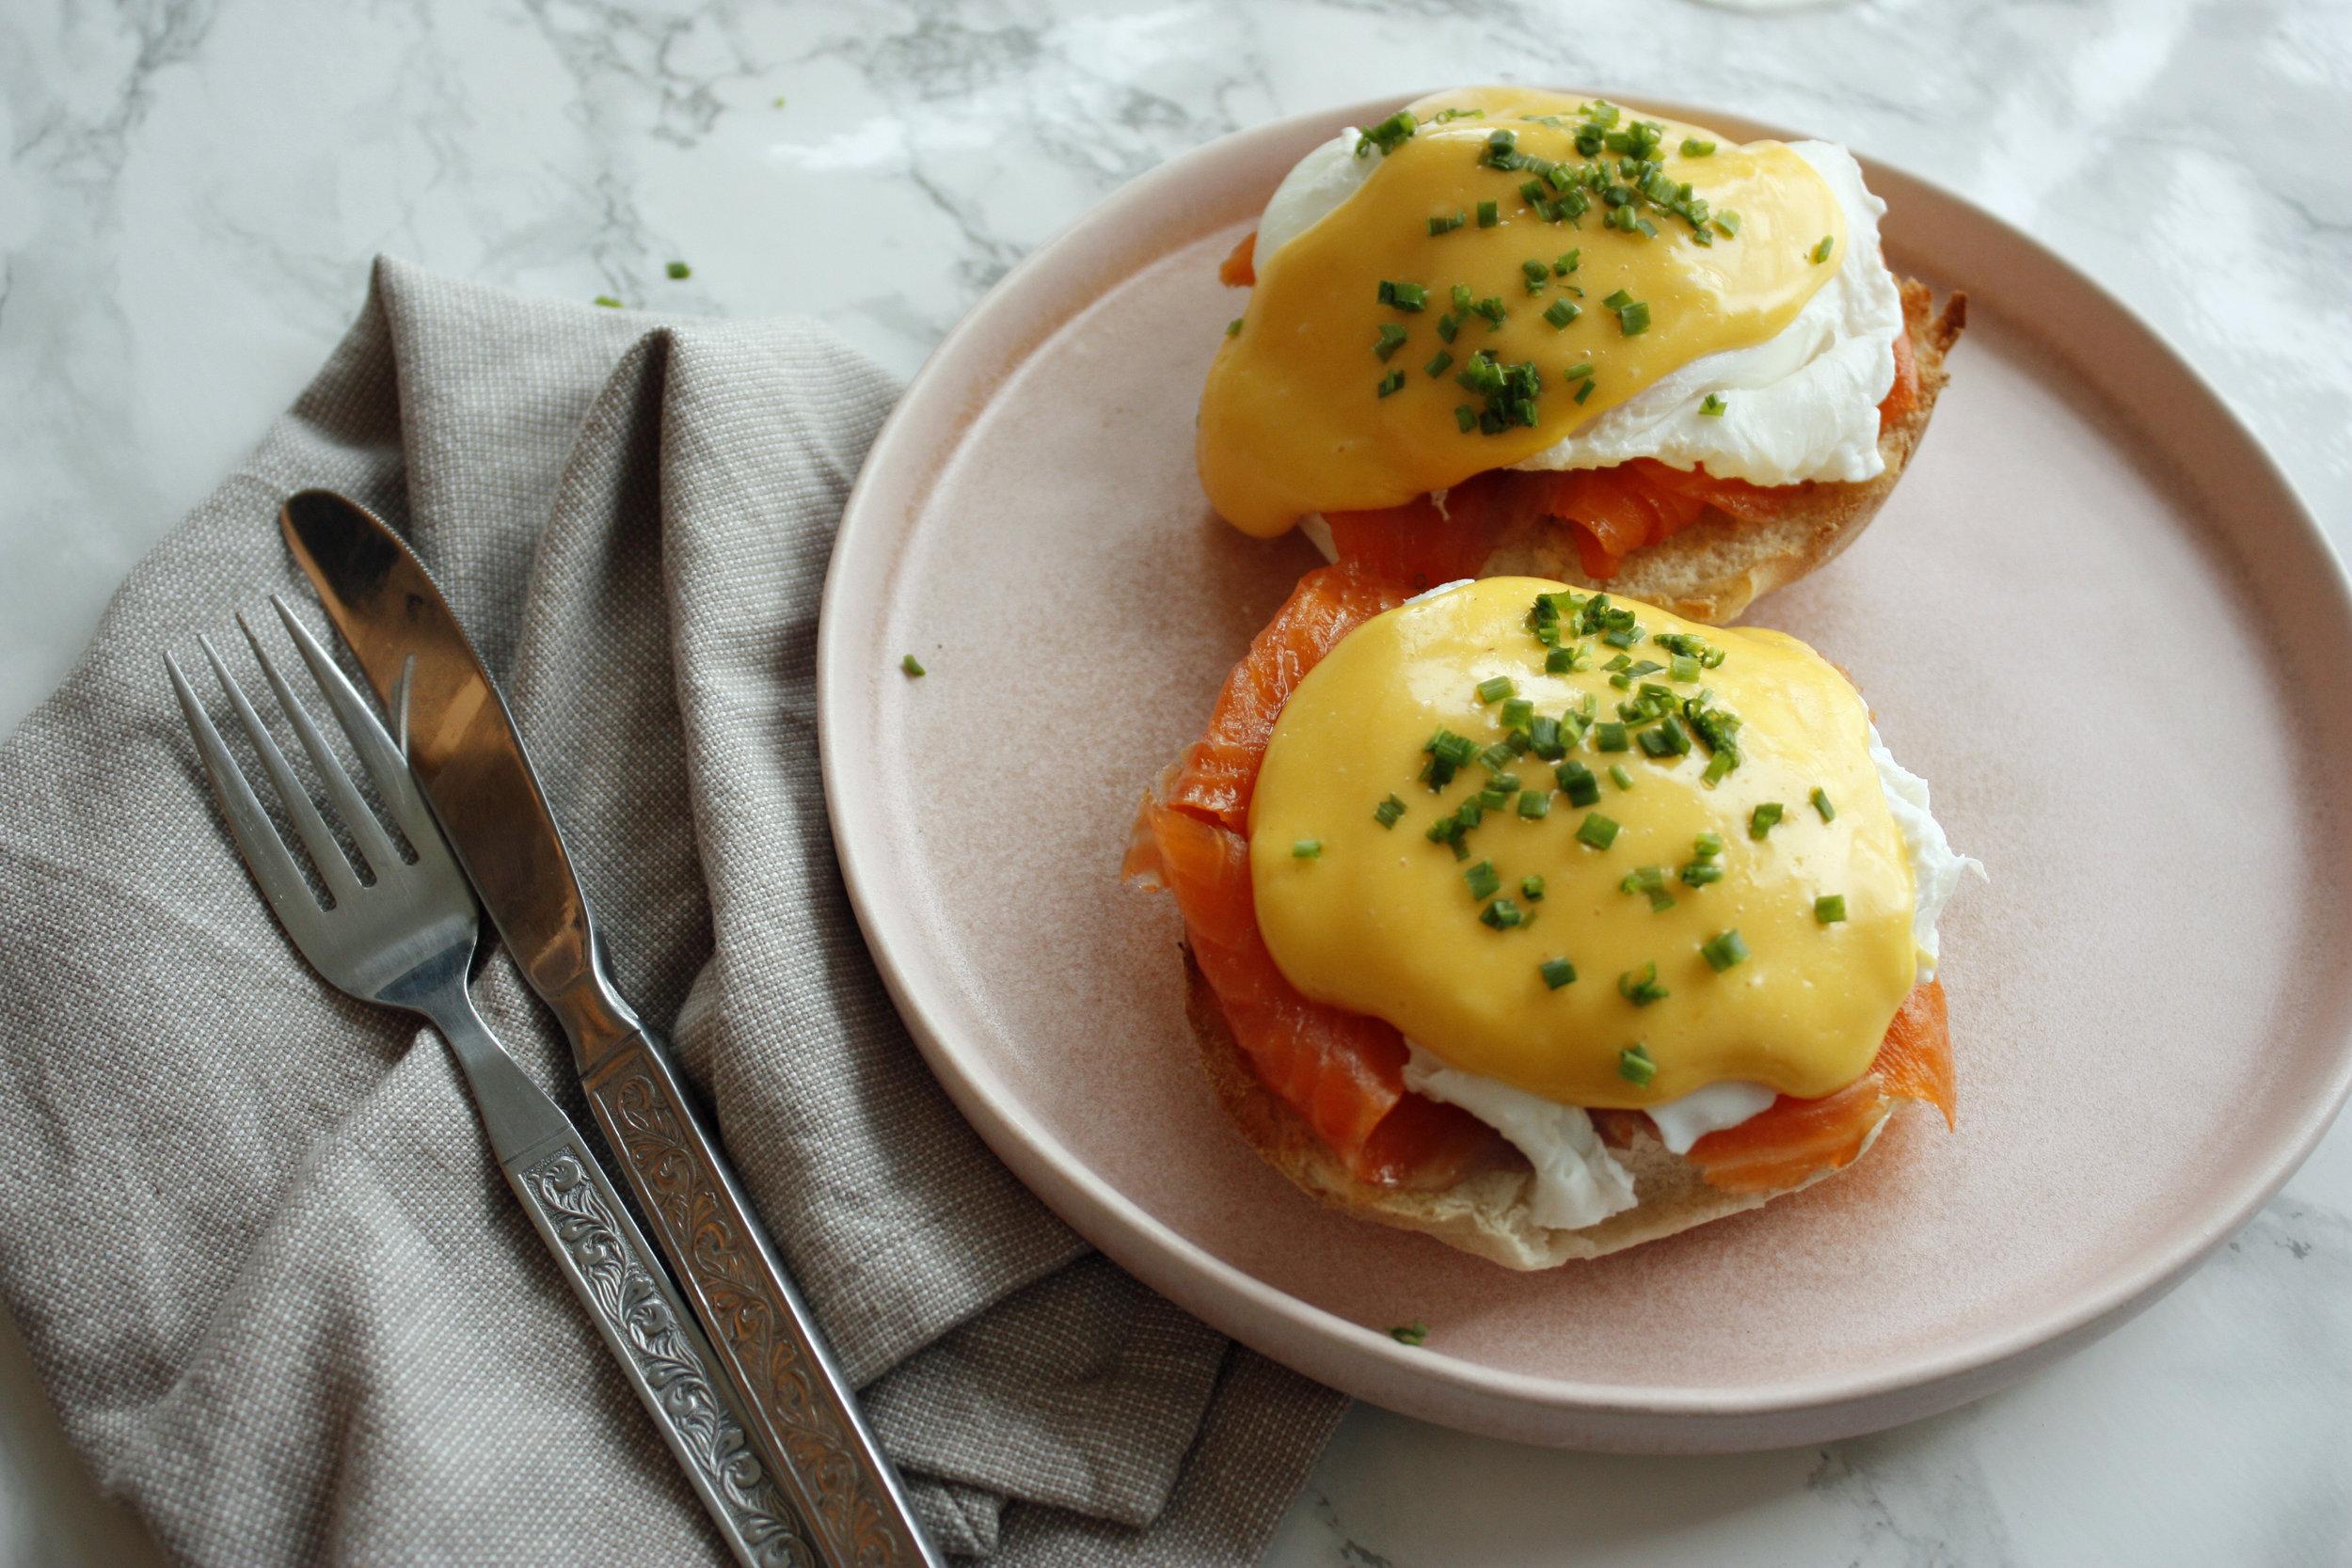 Eggs royale with hollandaise sauce